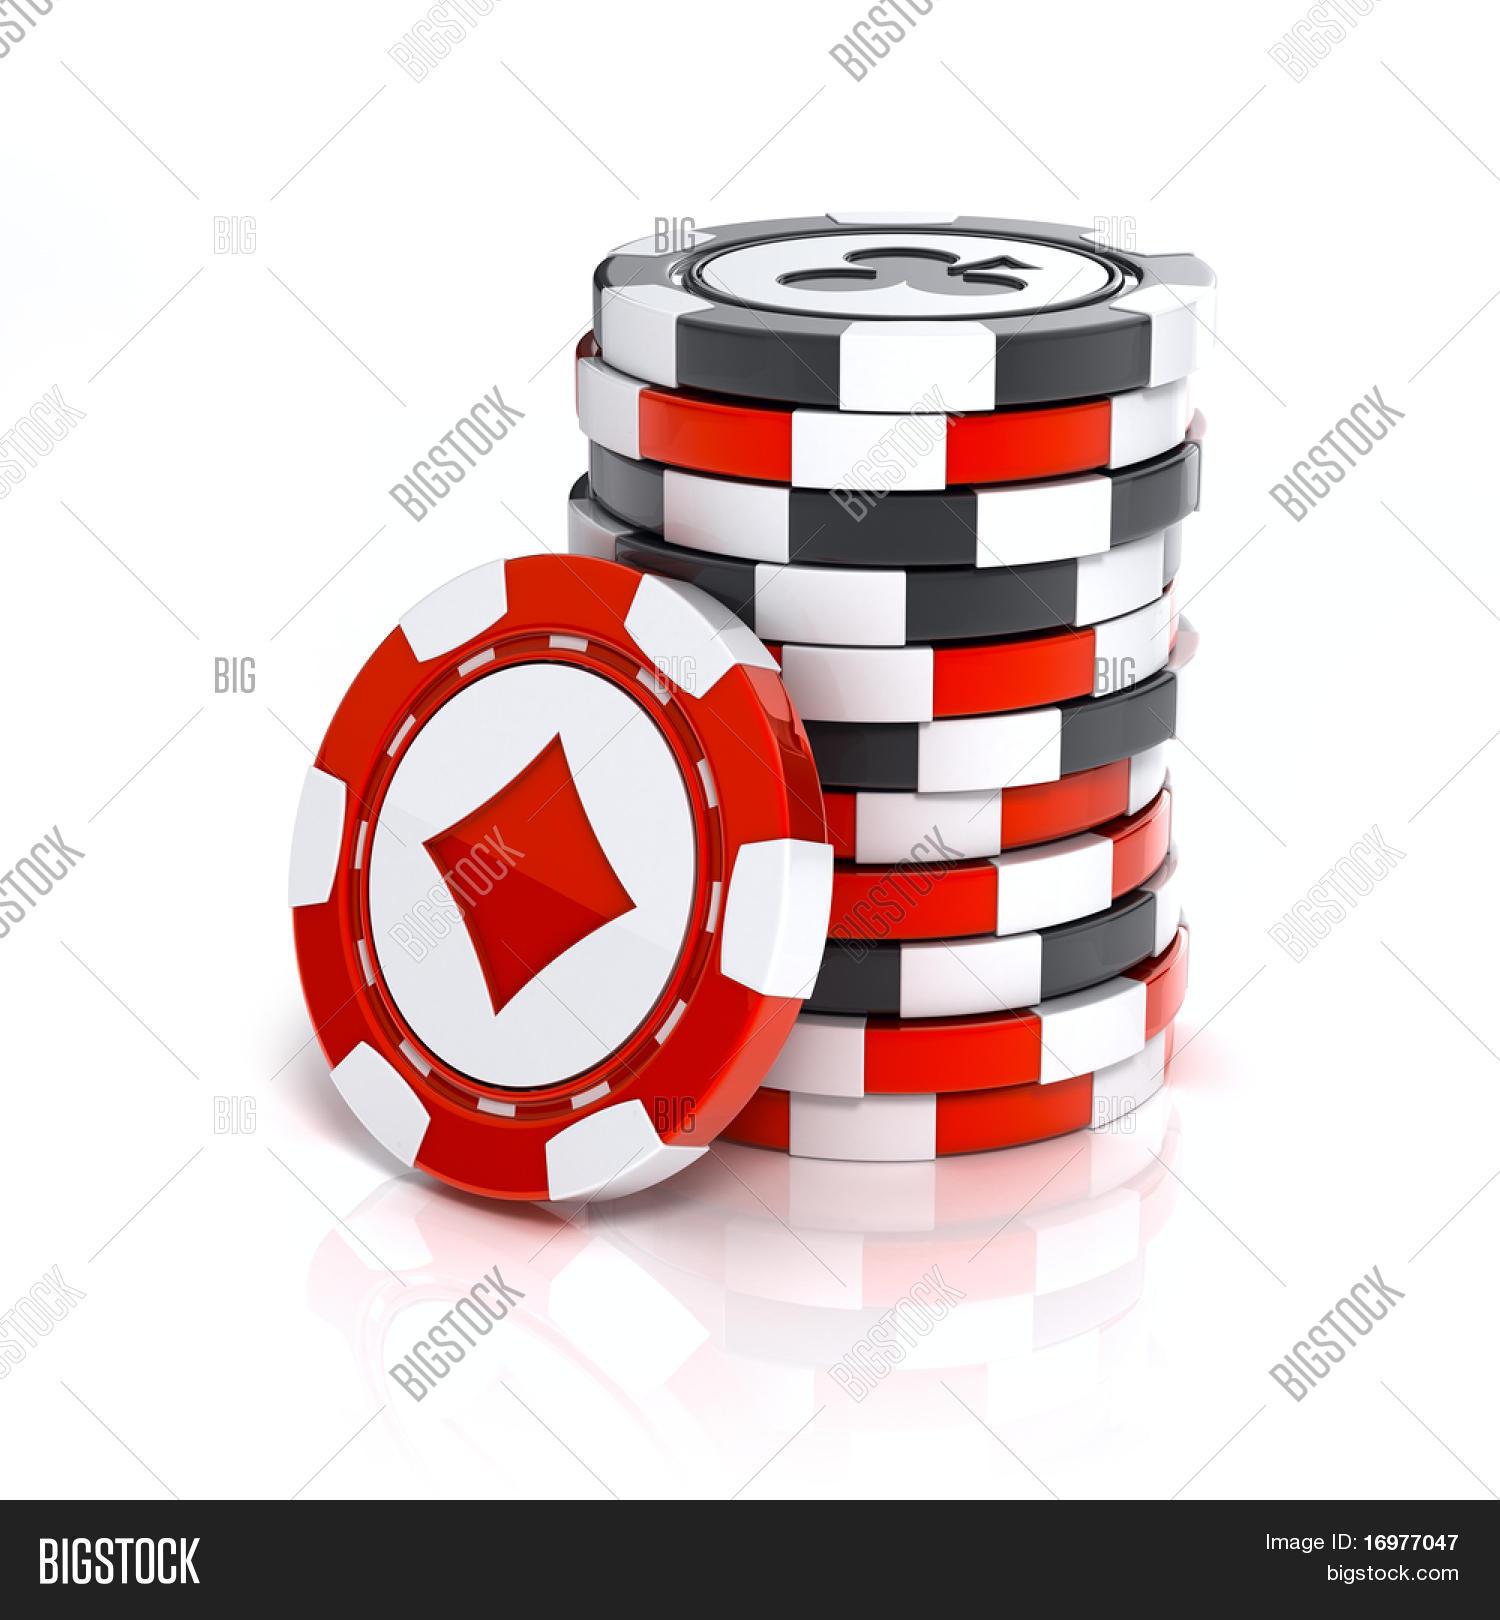 Casino Chip Stacks Over White Image & Photo | Bigstock